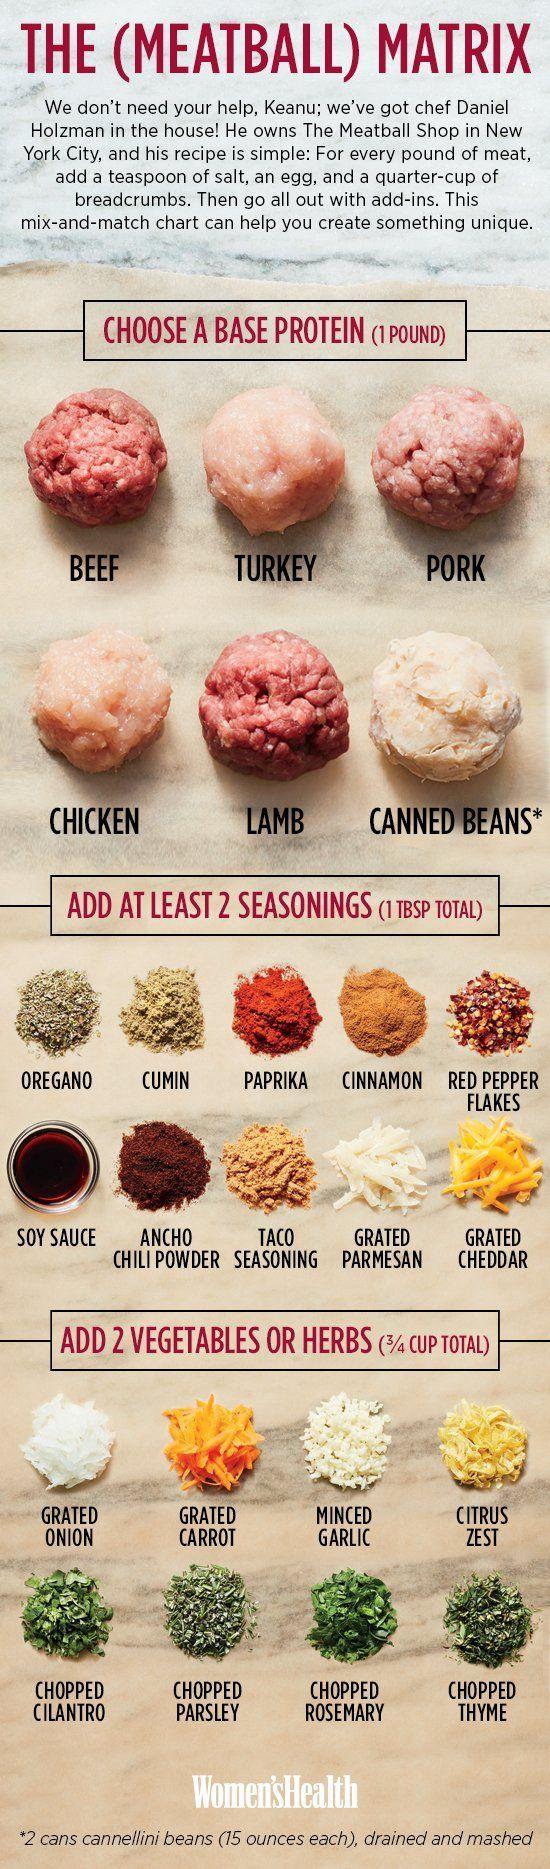 HealthyFood on Twitter Yummy food, Recipes, Food